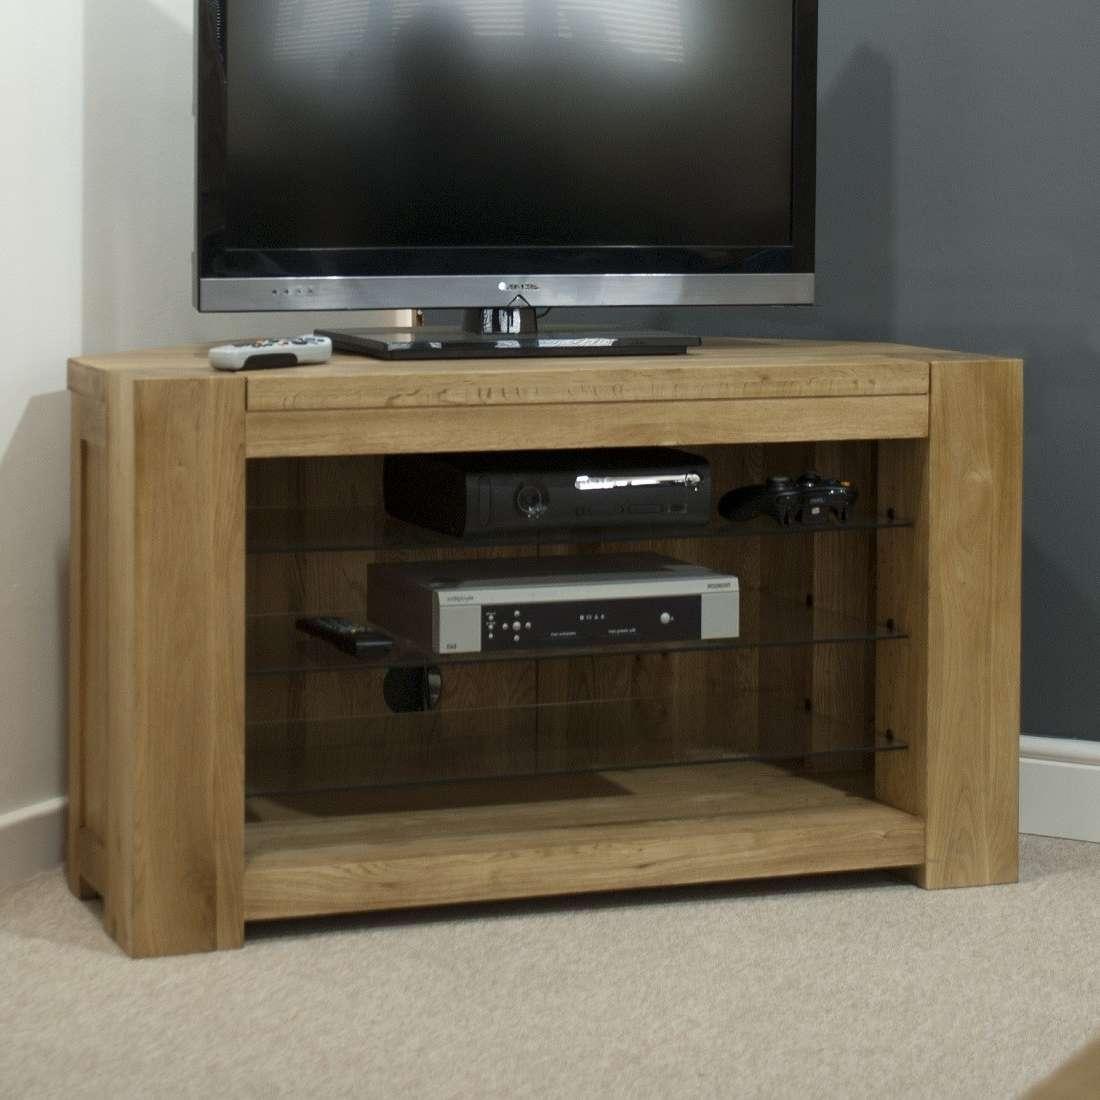 Trend Solid Oak Corner Tv Unit | Oak Furniture Uk In Solid Oak Corner Tv Cabinets (View 6 of 20)